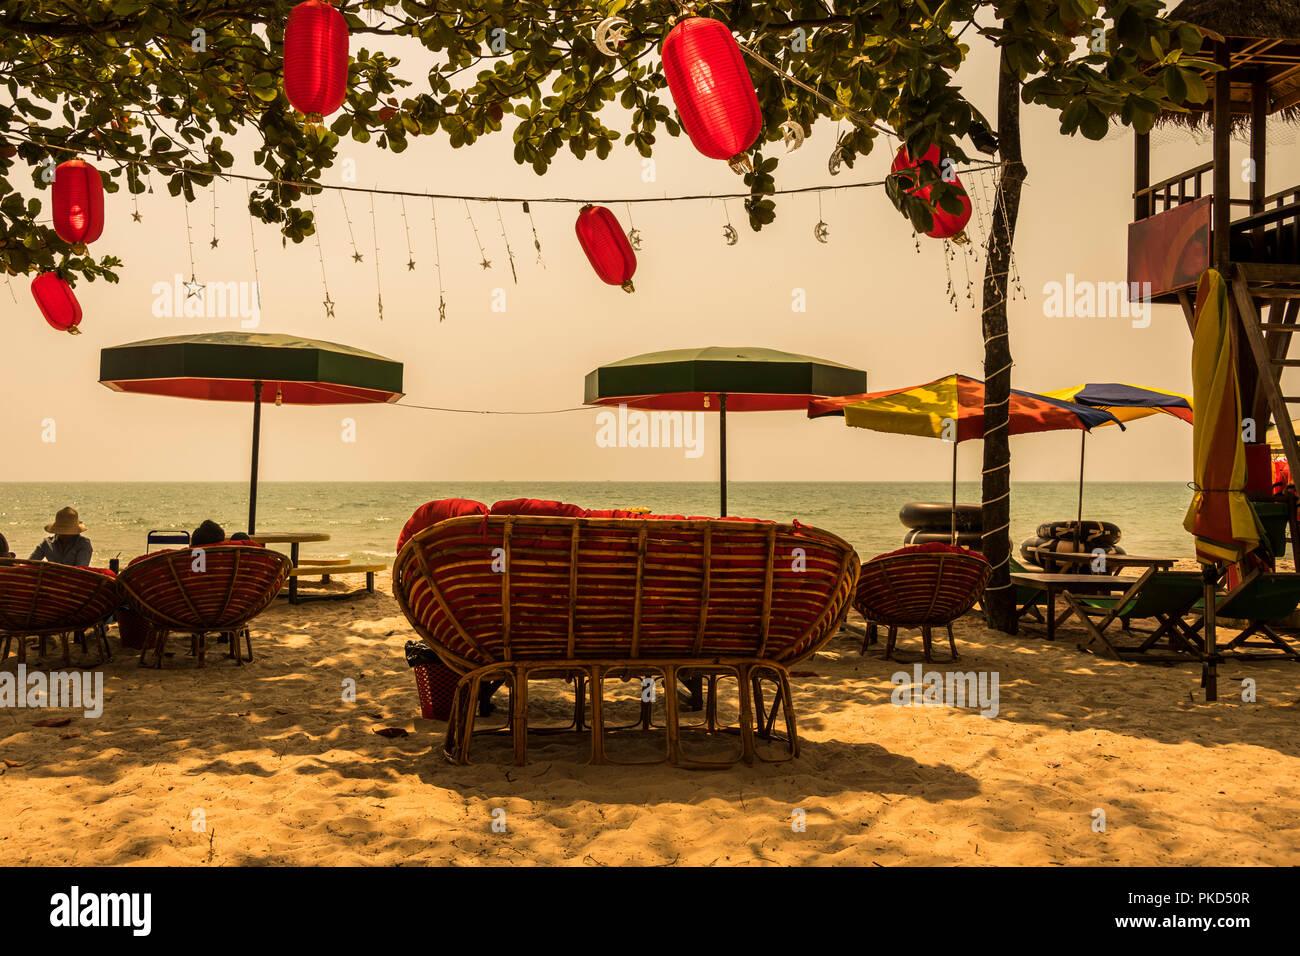 Sun day in ochheuteal beach near the city of Sihanoukville. Cambodia - Stock Image